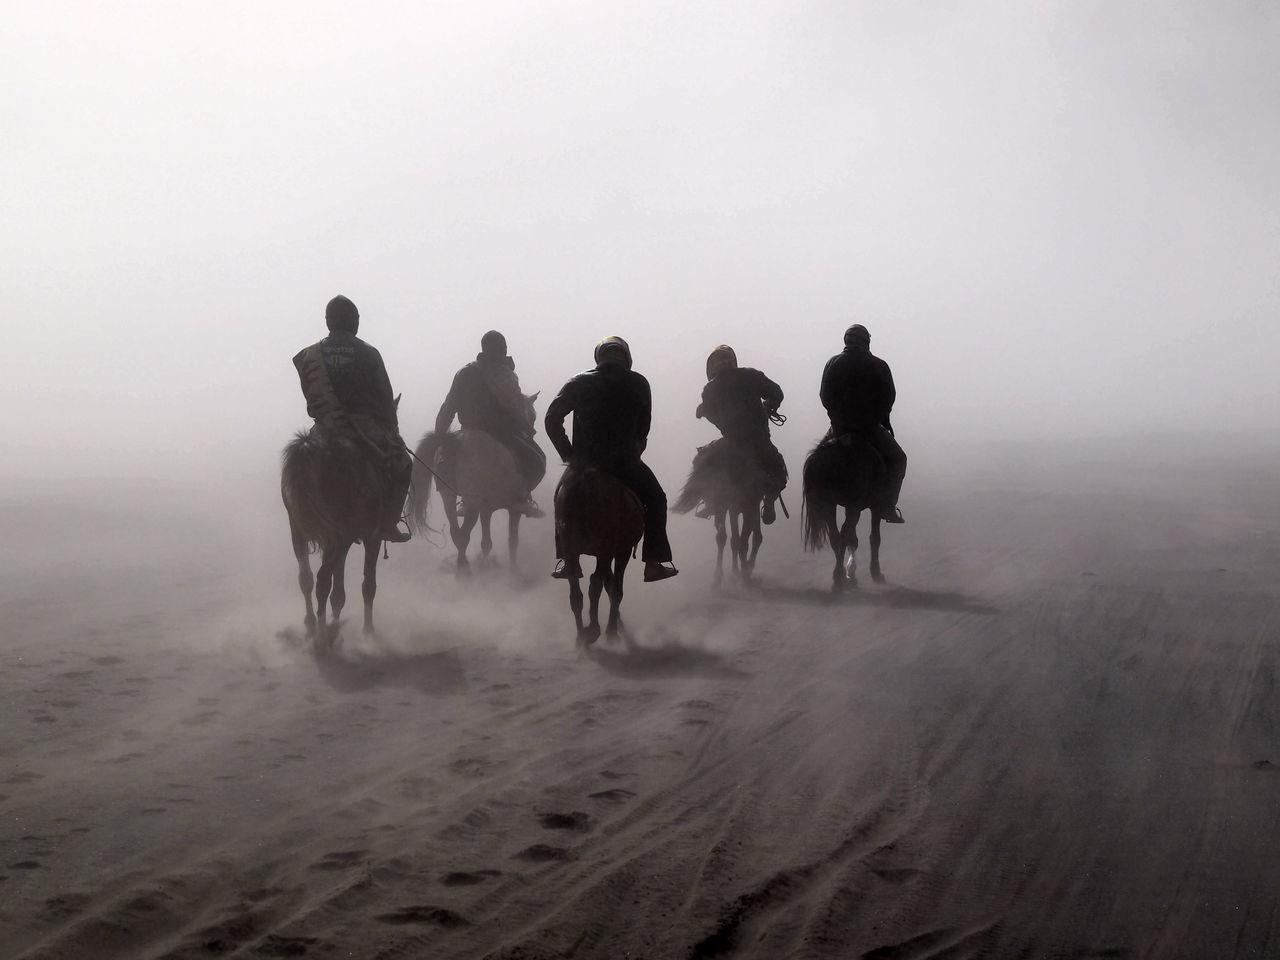 PEOPLE WALKING ON SAND DUNES IN DESERT